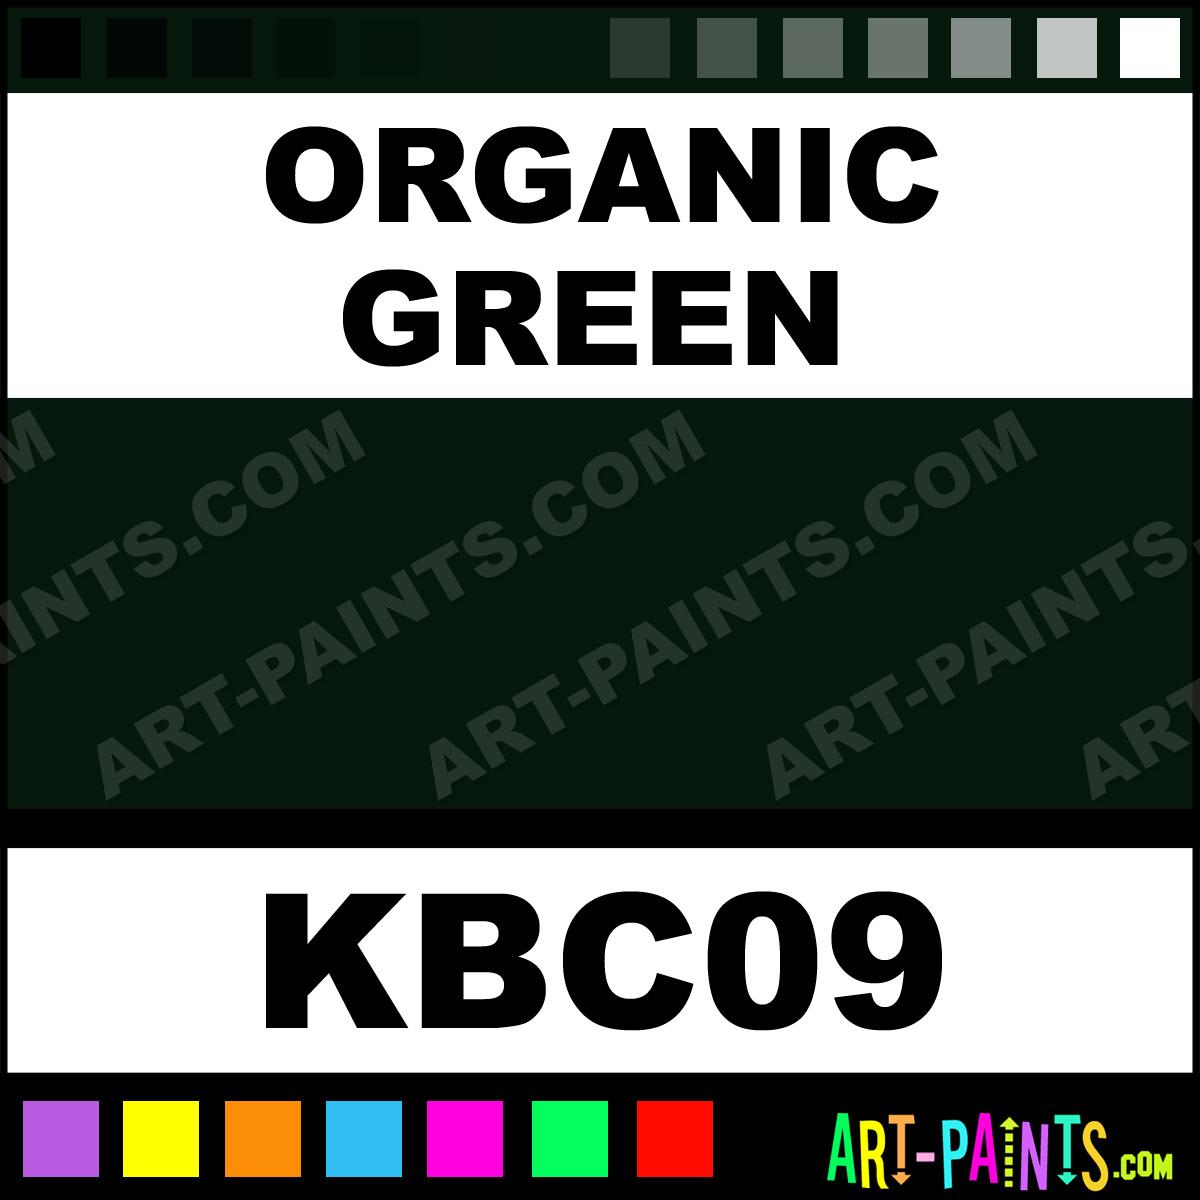 Organic Green Kandy Paint